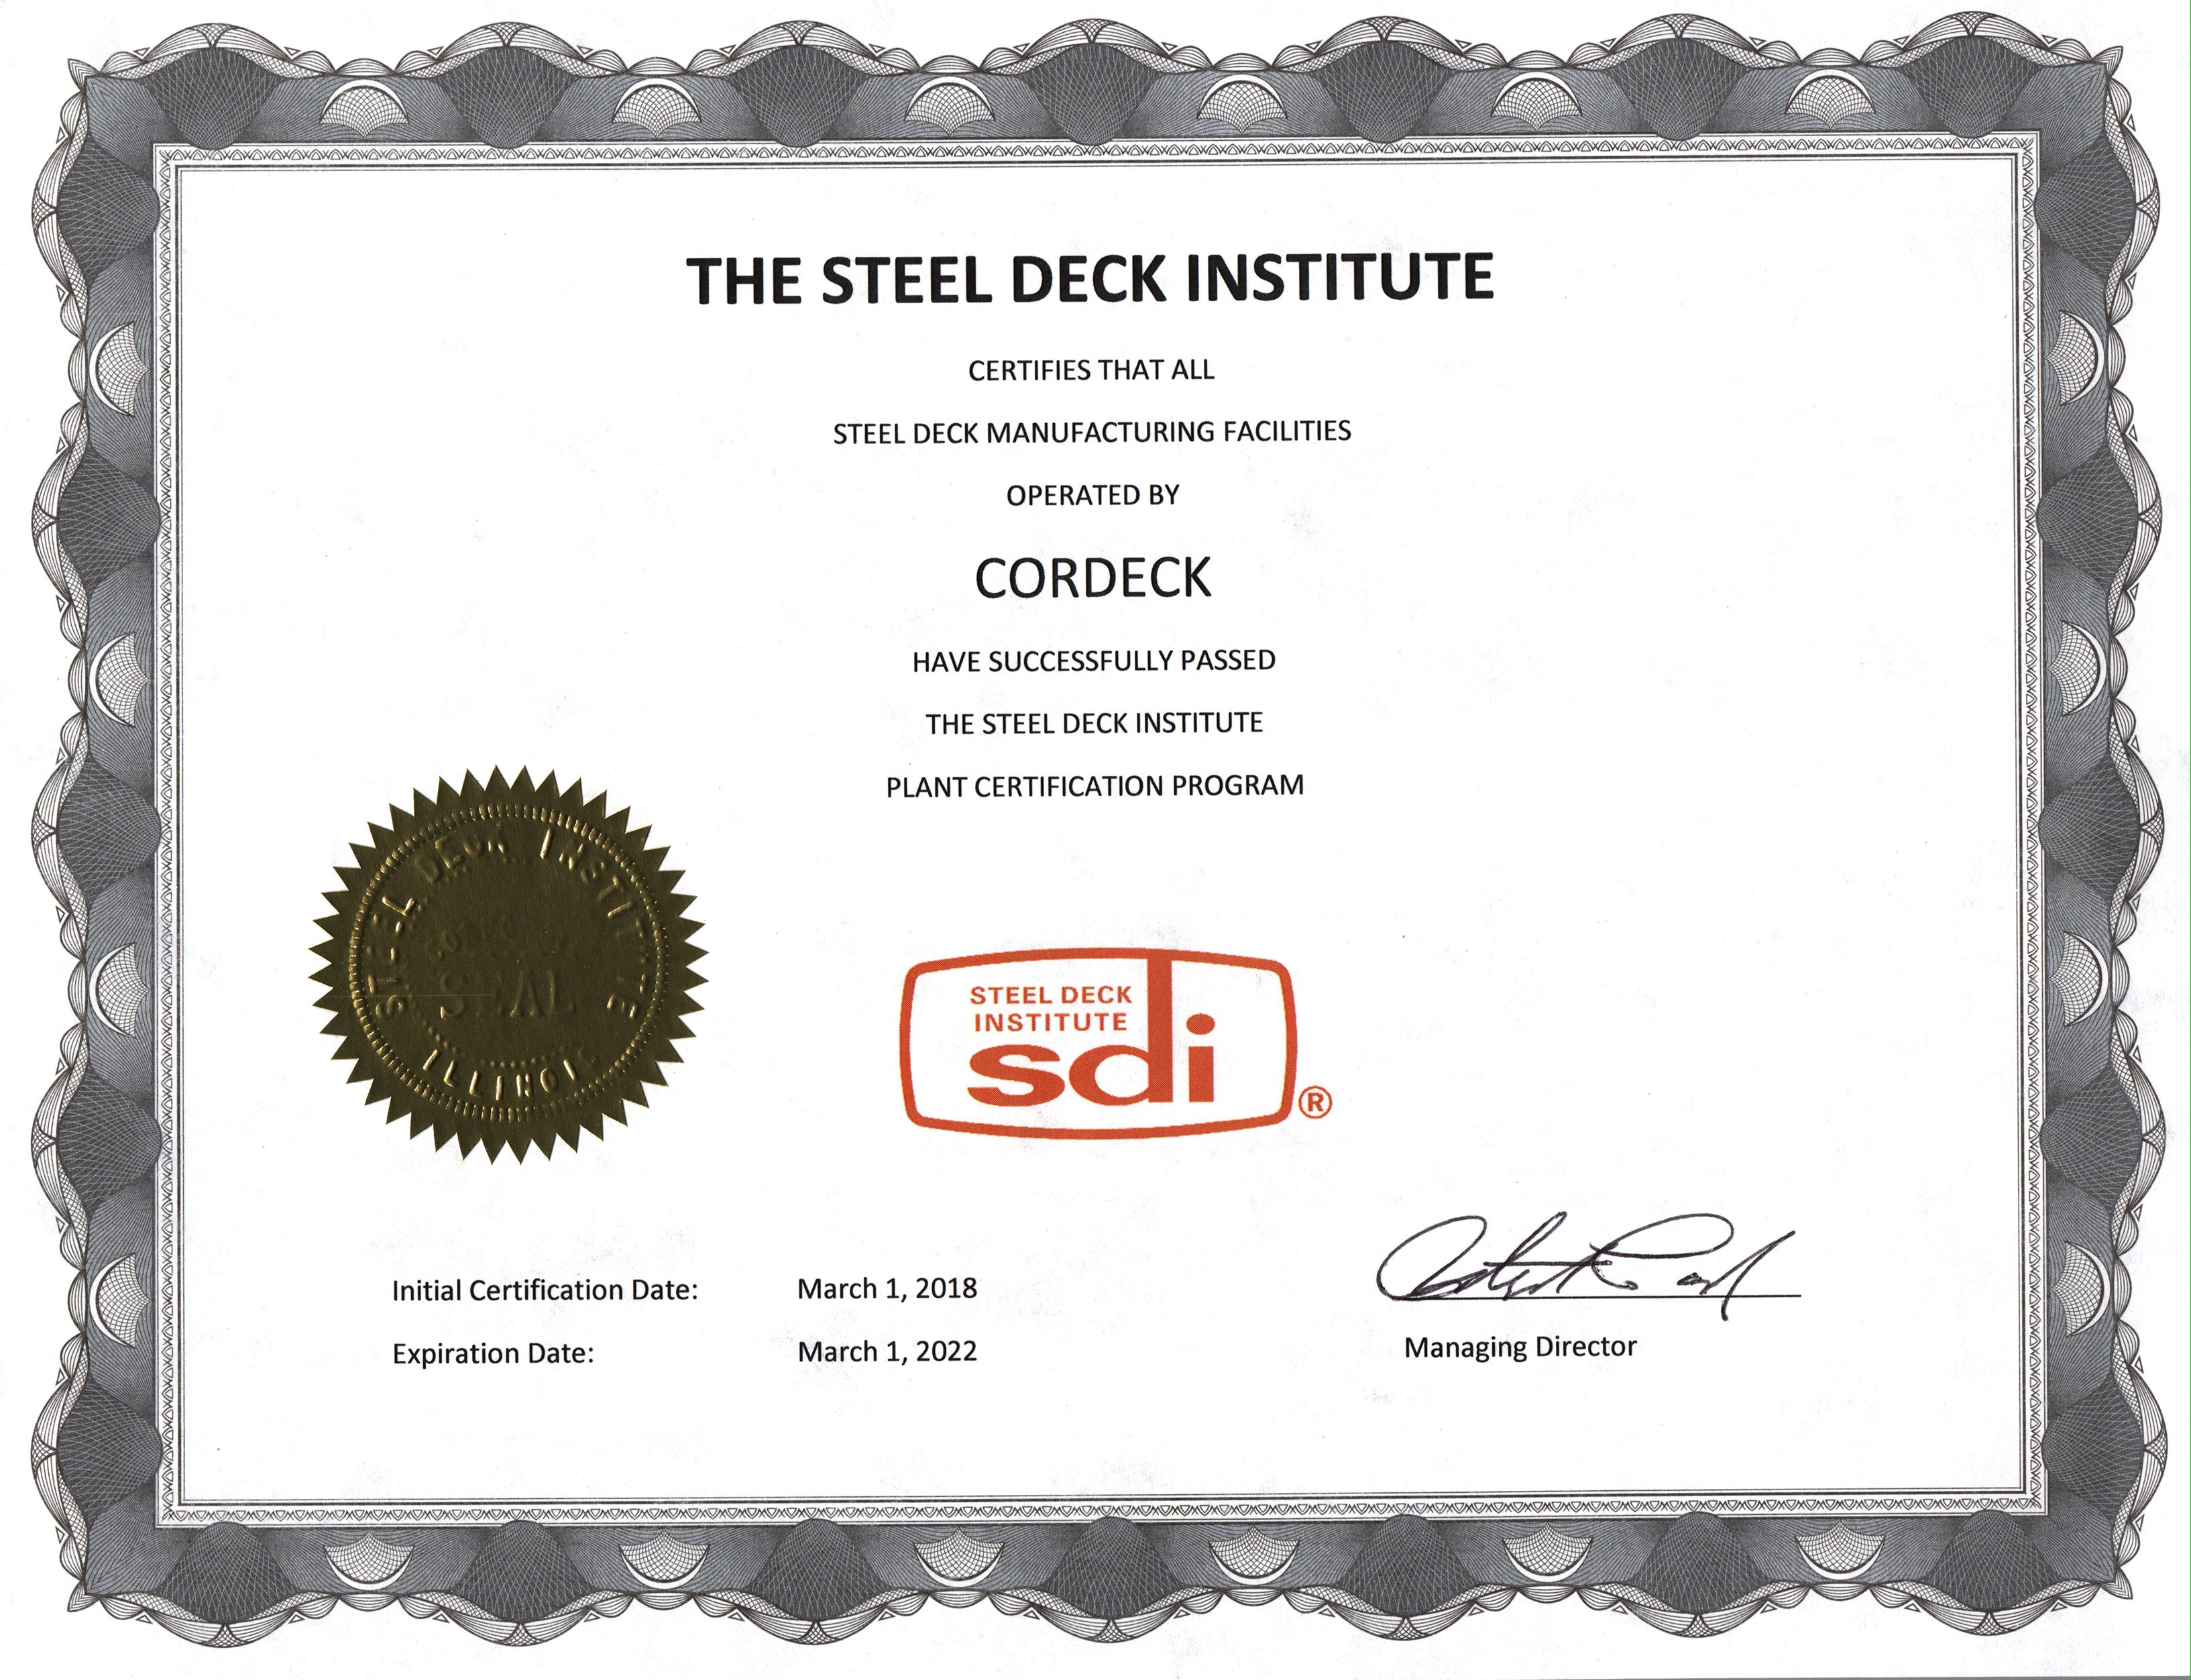 Cordeck SDI Certificate